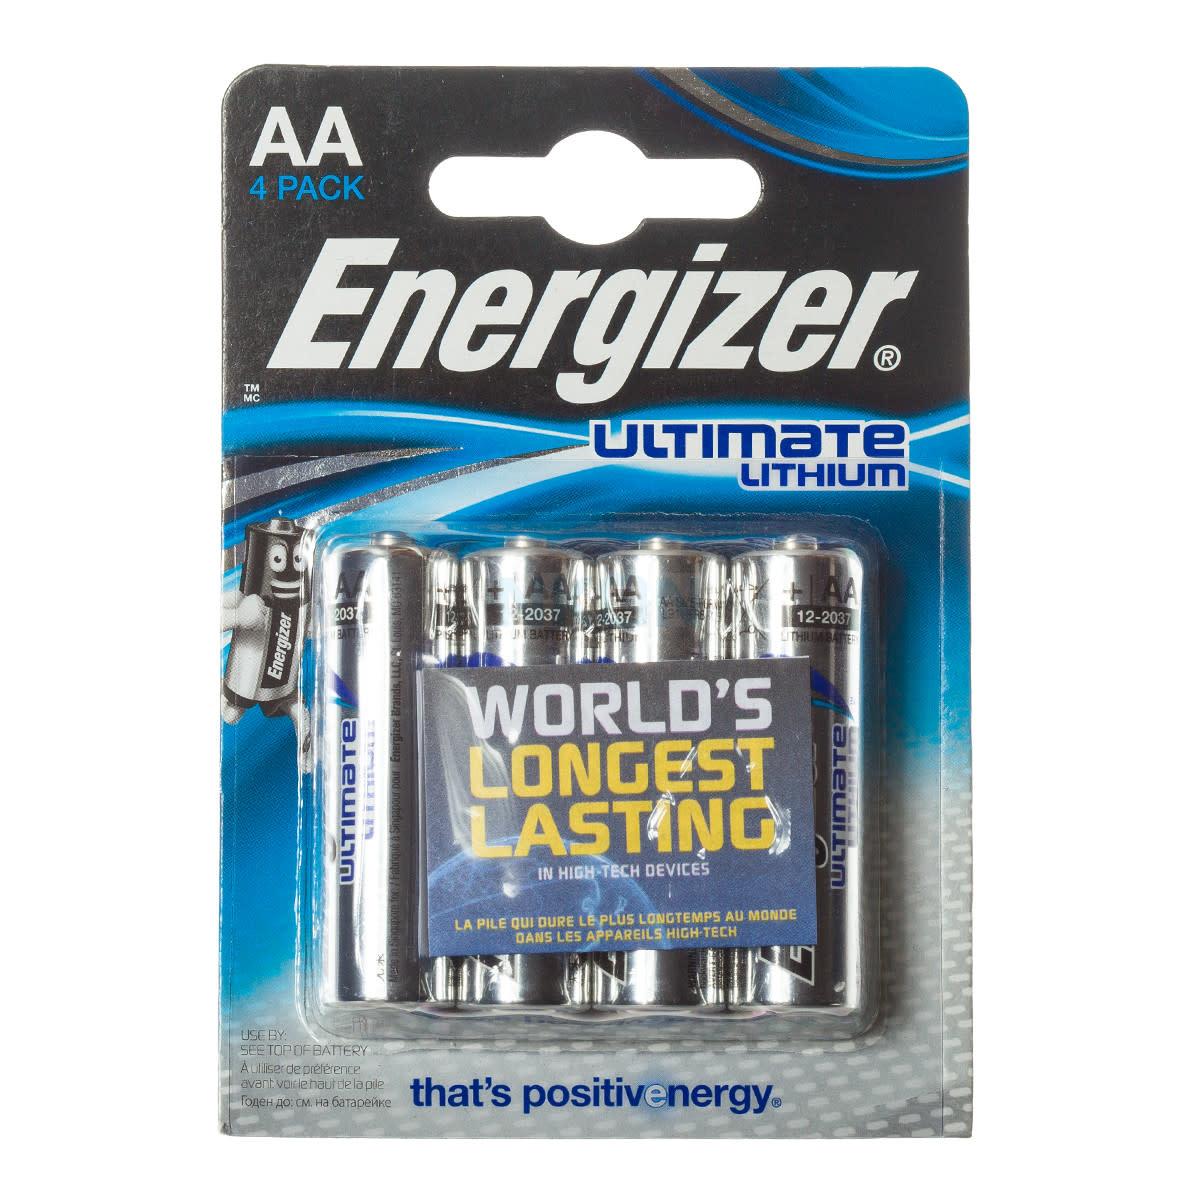 ENERGIZER Energizer Ultimate Lithium 4xAA